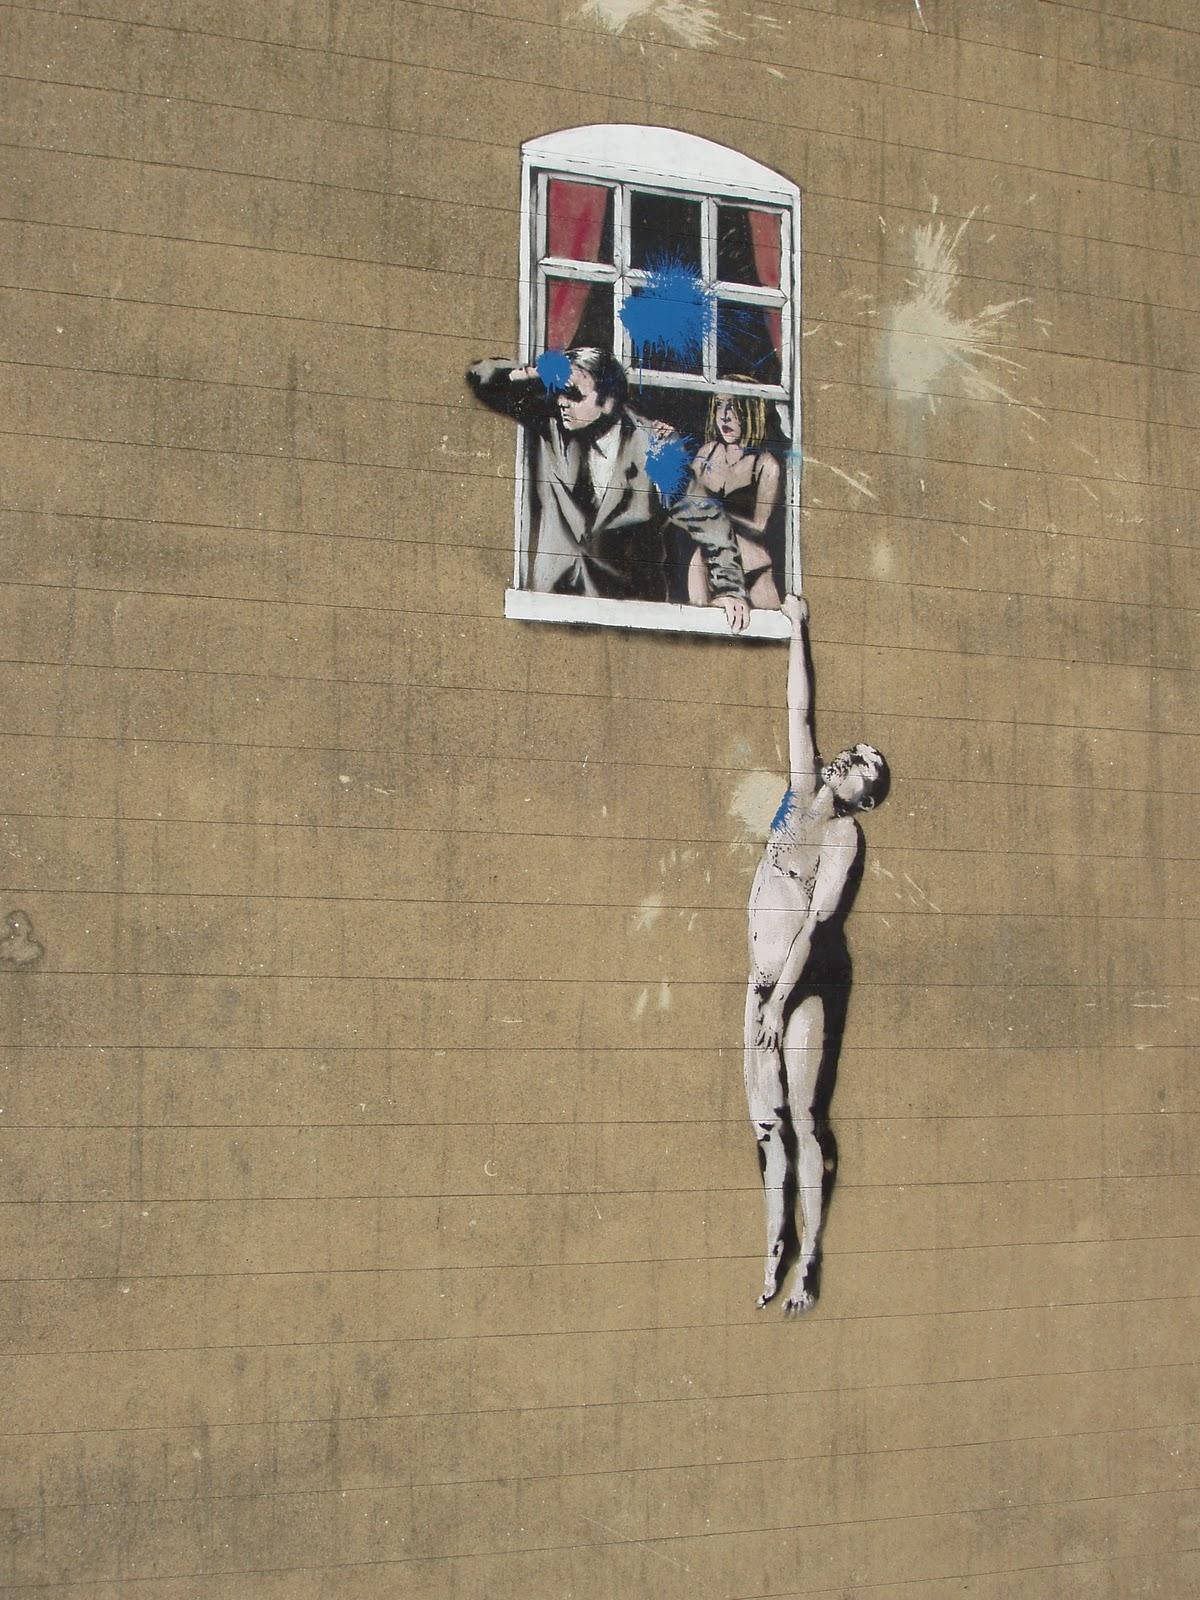 banksy an england based graffiti artist political Banksy is an england-based graffiti artist, political activist and film director of unverified identity his satirical street art and subversive epigrams combine dark.